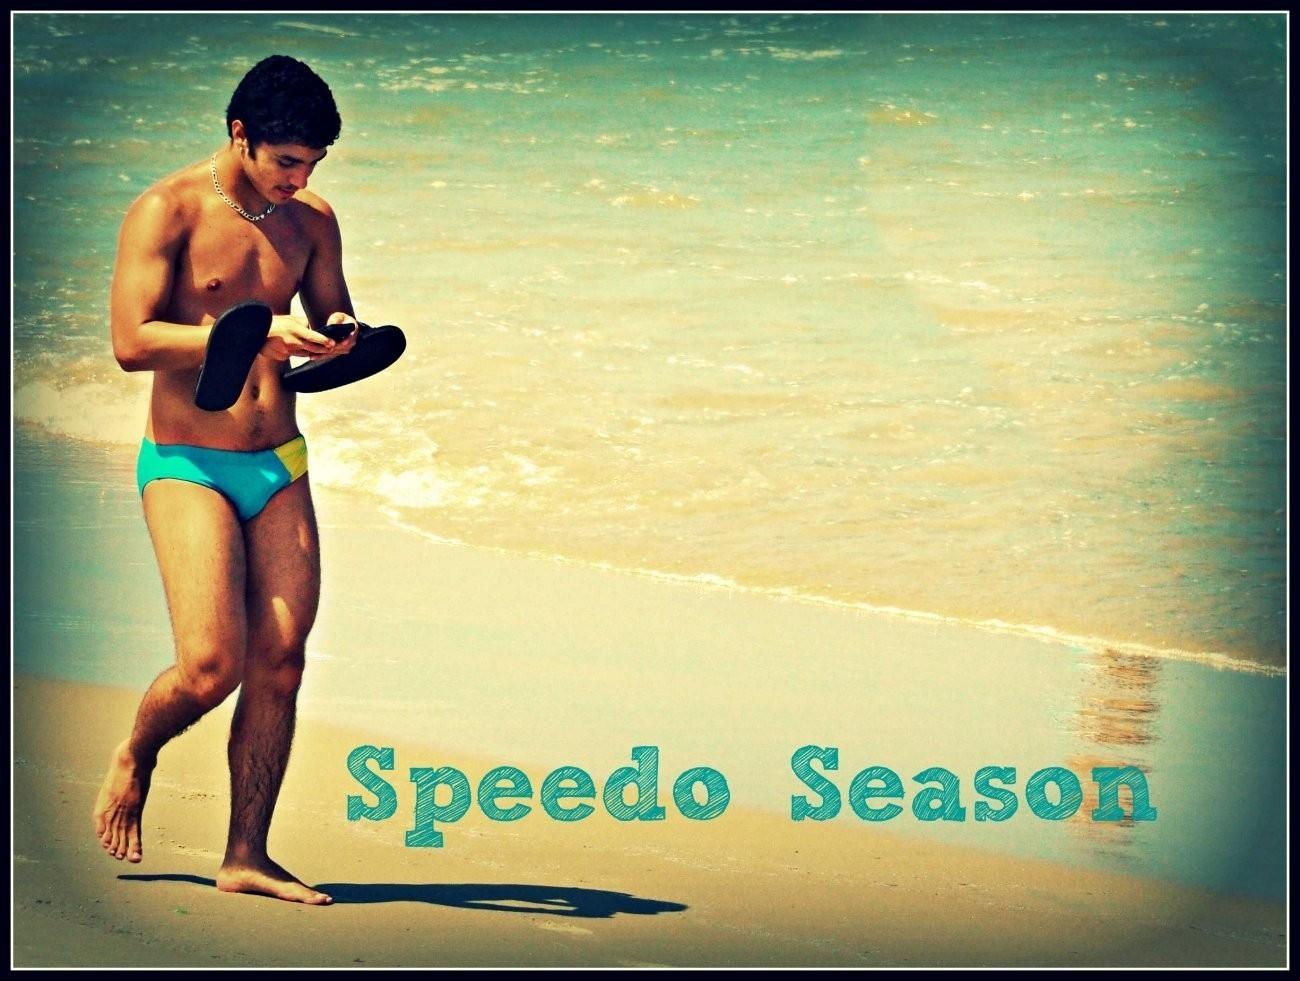 speedo-edit1.jpg